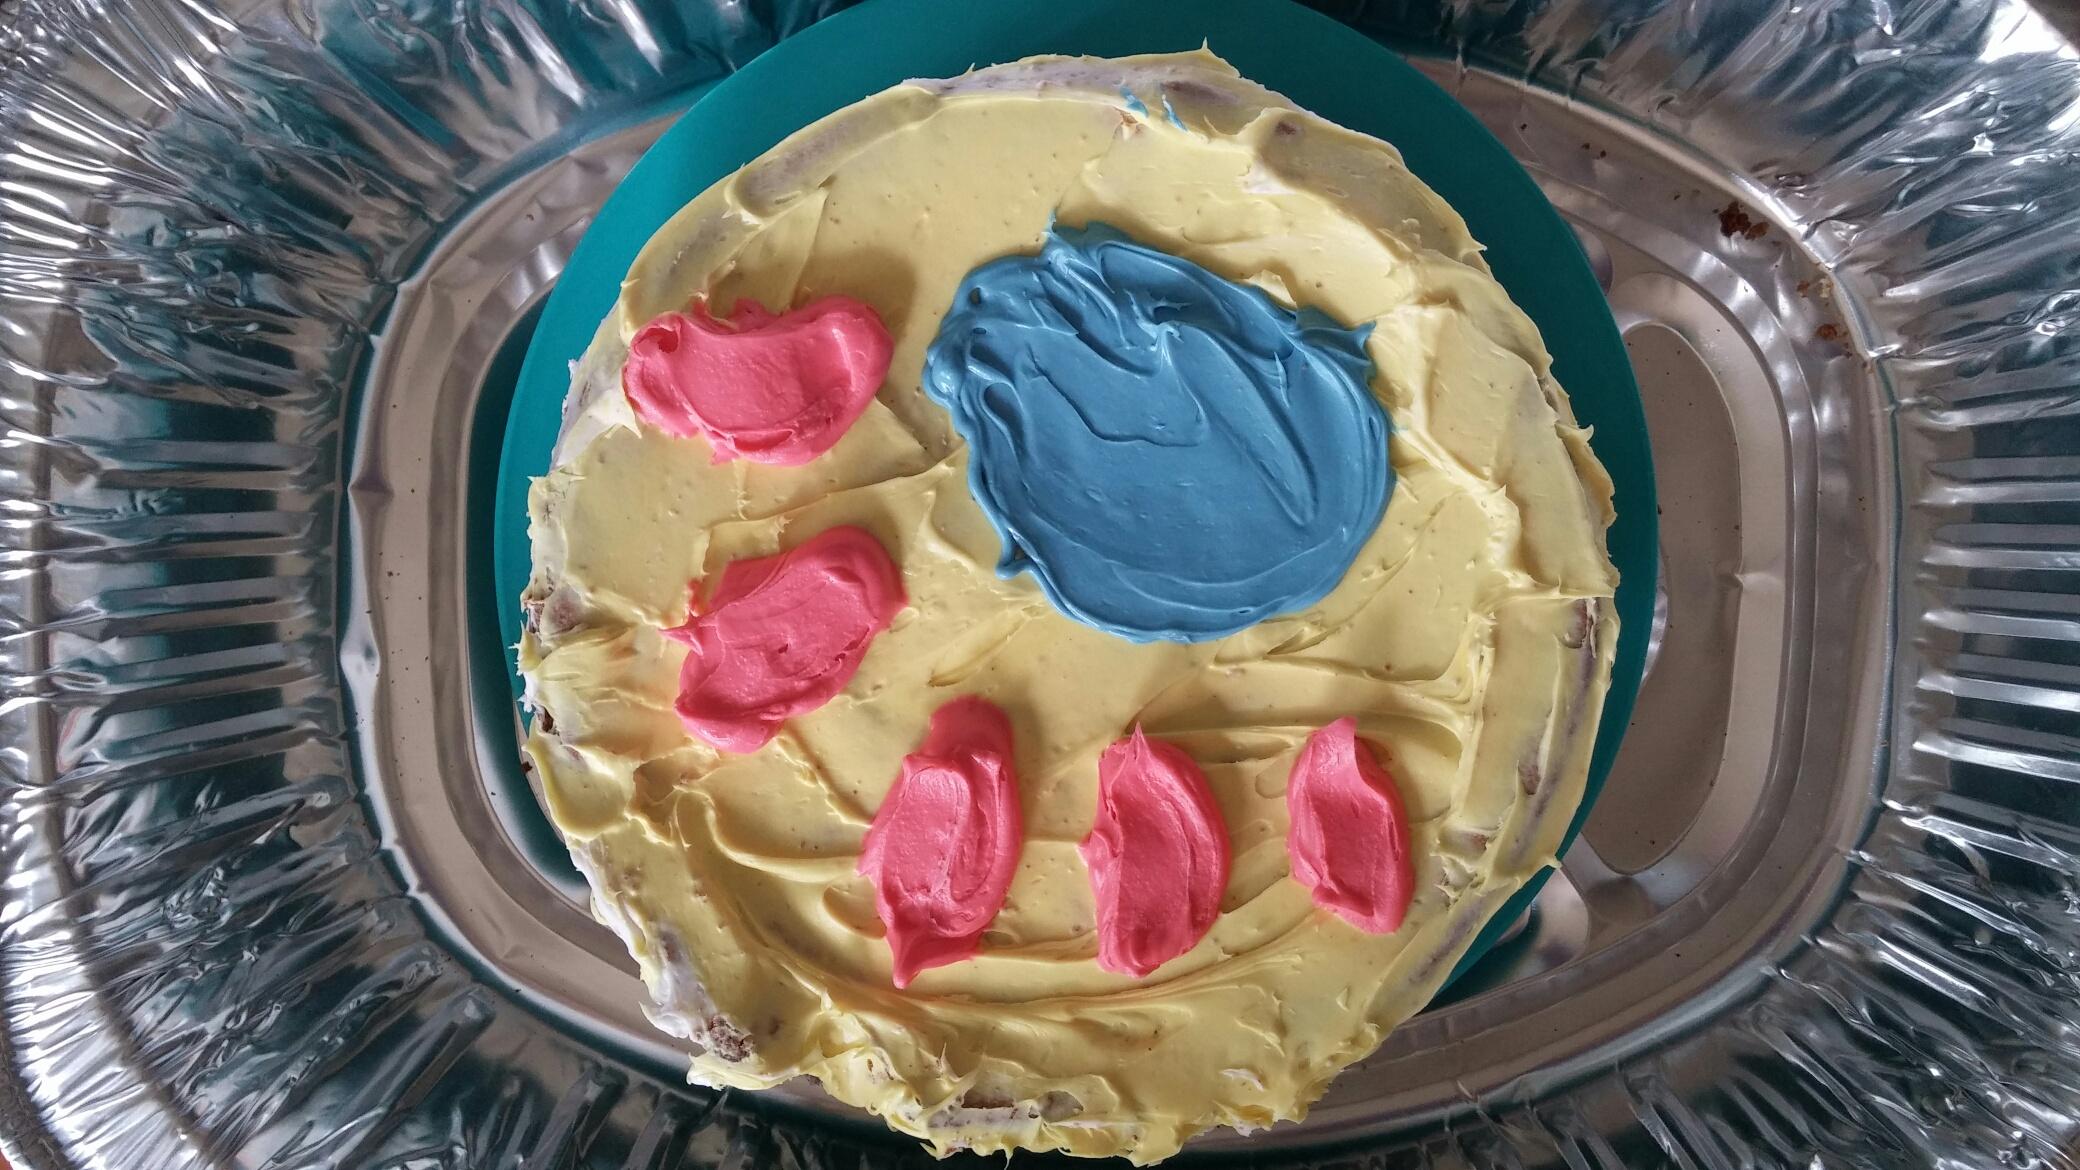 Lymph node cake